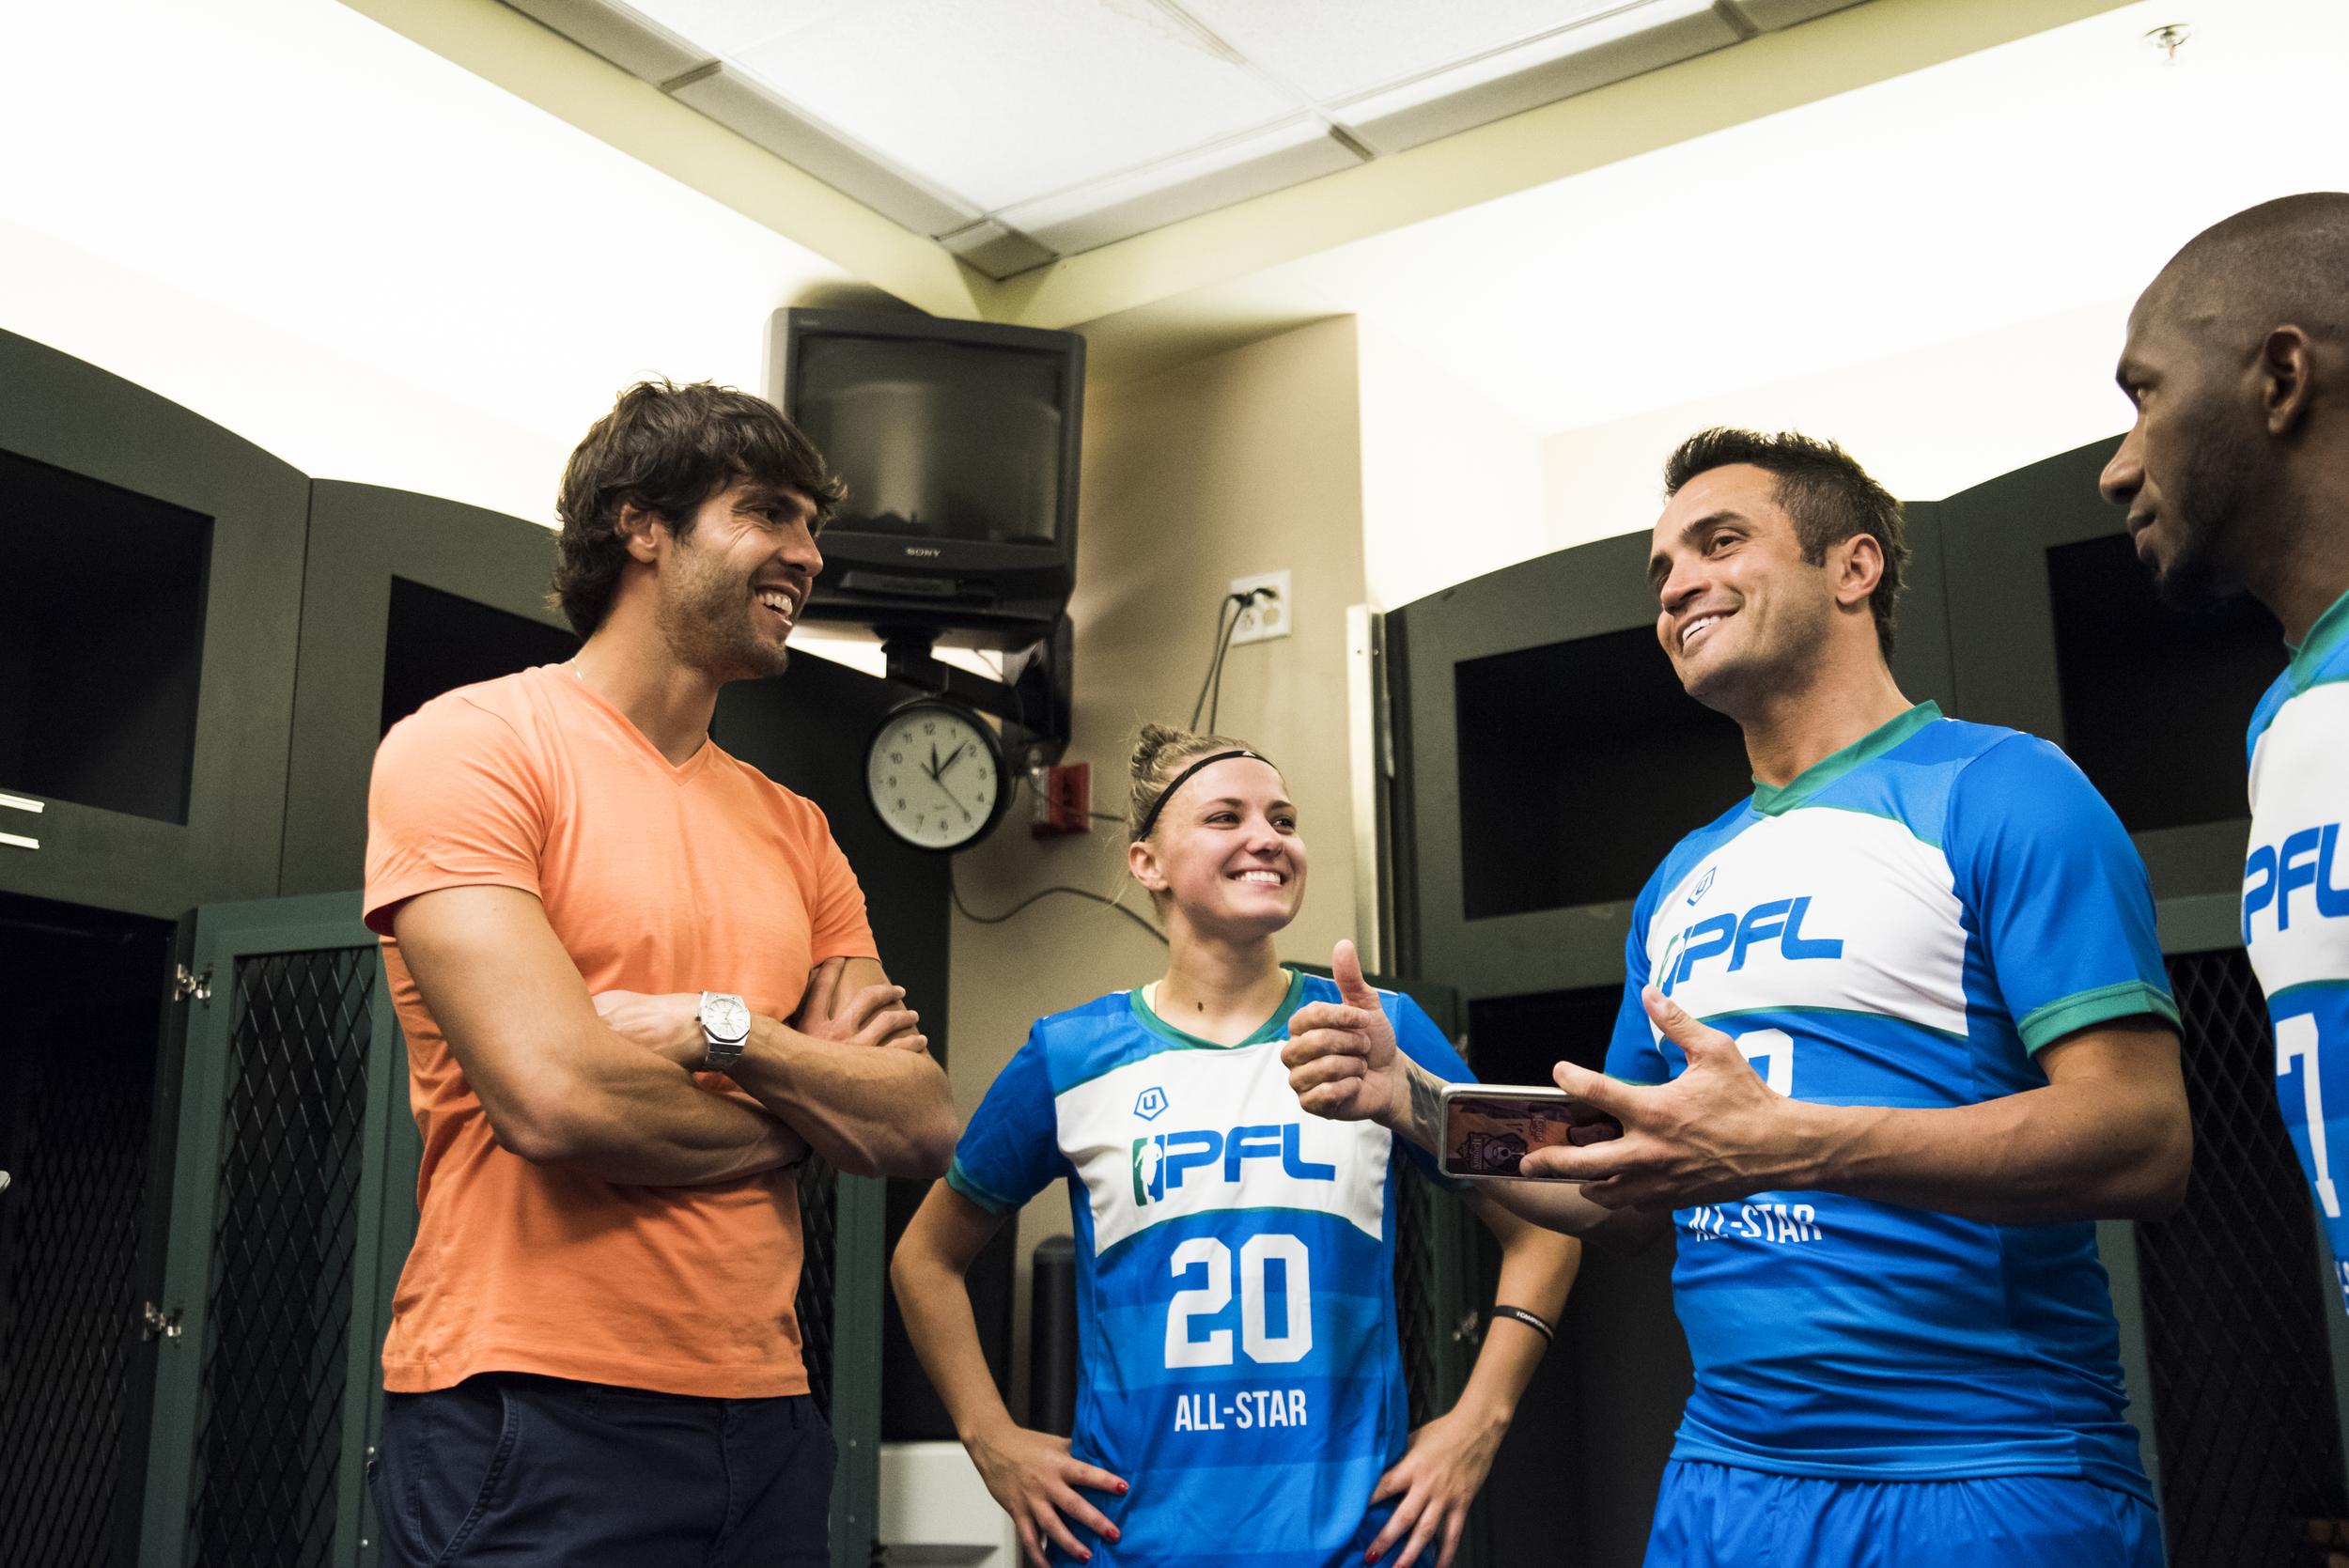 Orlando City SC midfielder and Brazilian soccer icon, Kakà  stopped in to visit his countryman,Falcão.